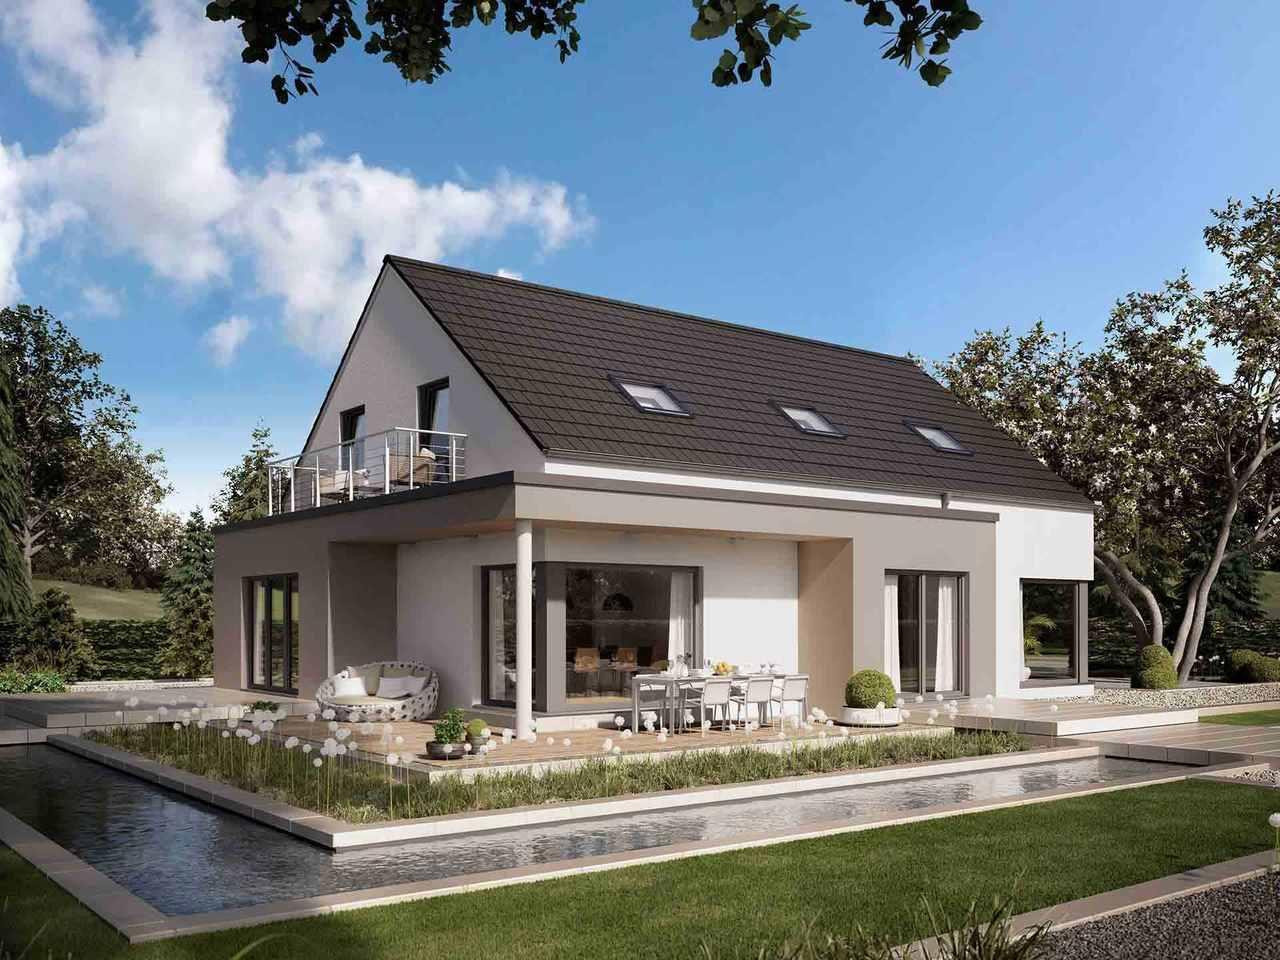 Einfamilienhaus Selection-E-169 E2 - Schwabenhaus